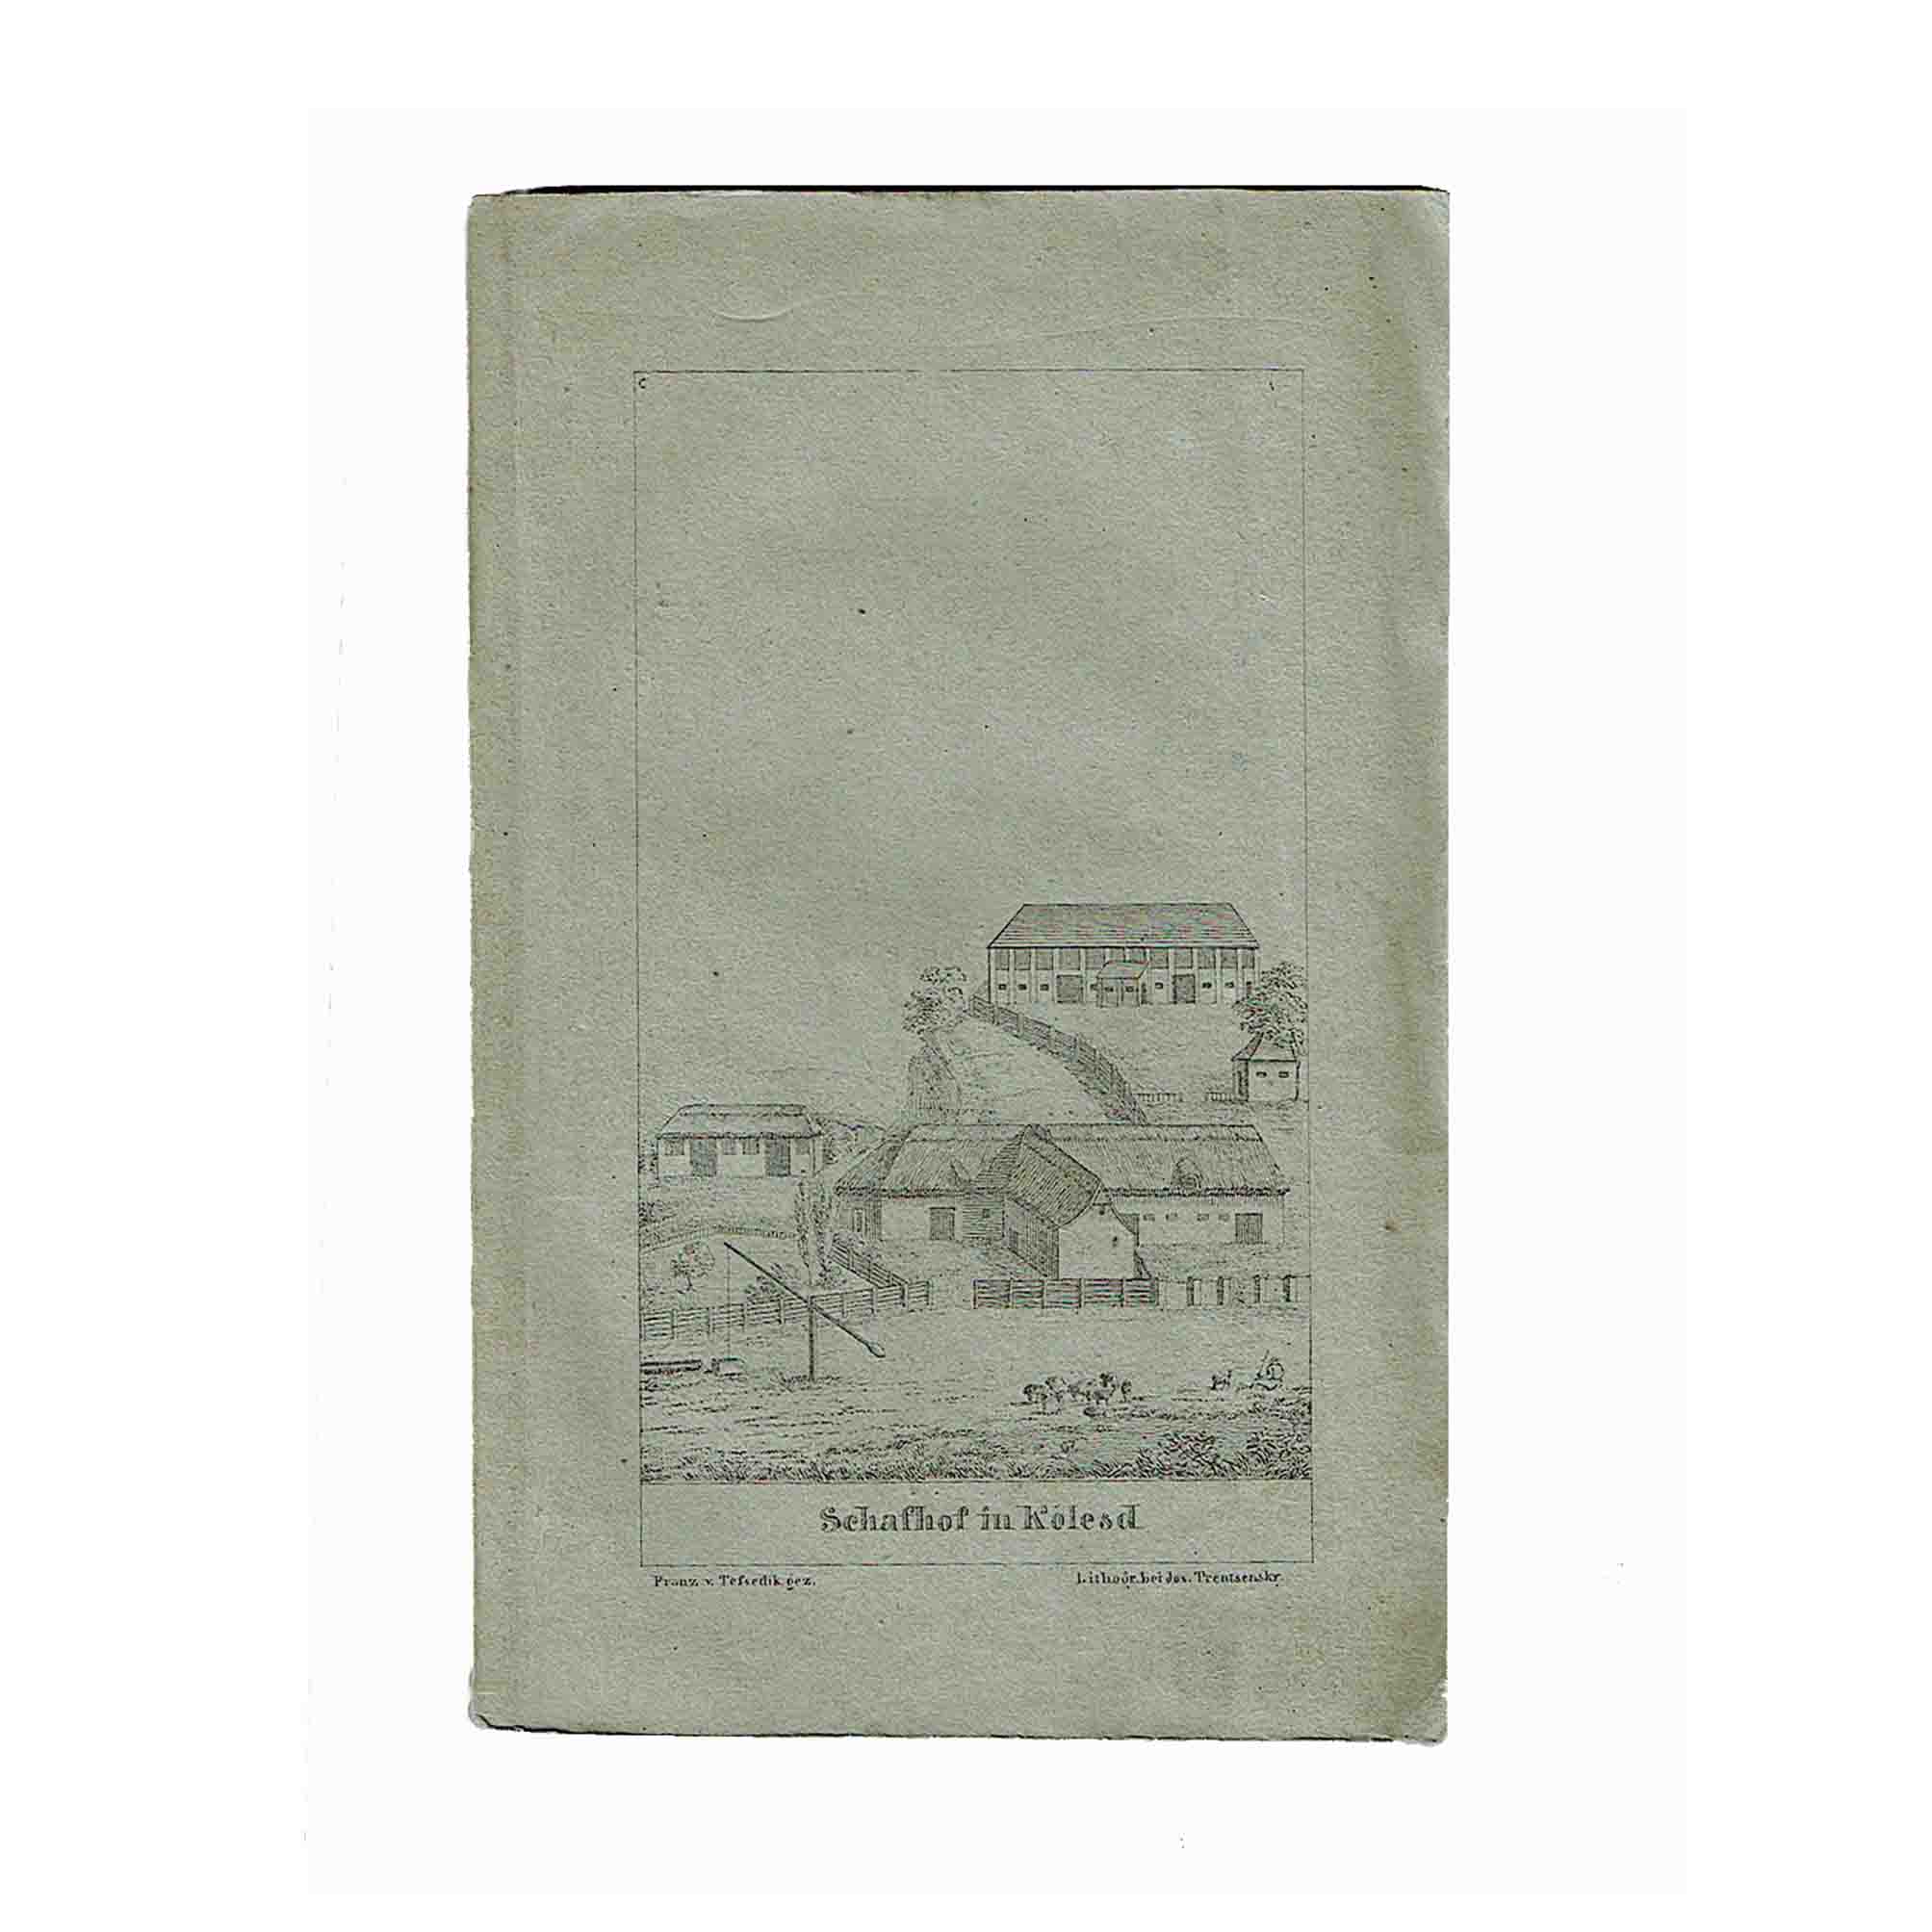 5640-Bartossagh-Schafe-1827-Umschlag-Lithografie-Kölesd-frei-N.jpg